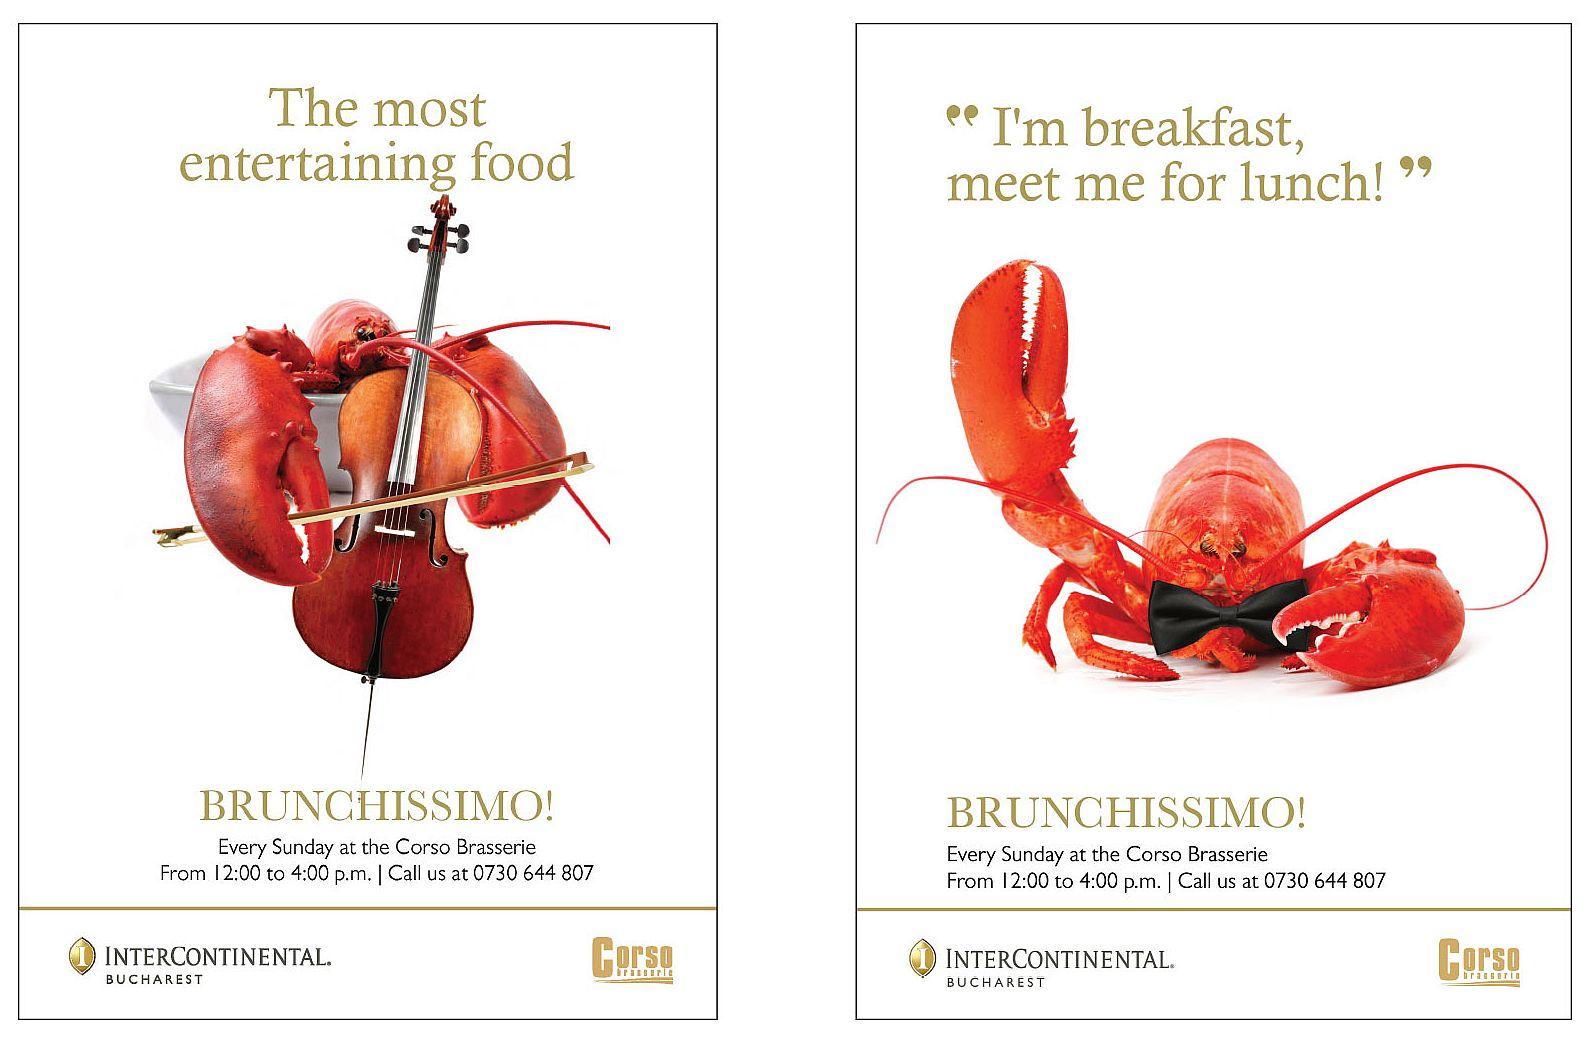 Mister Lobster, personajul simpatic si cosmopolit creat si declinat smart de echipa Eikon Seven http://www.eikon7.com/